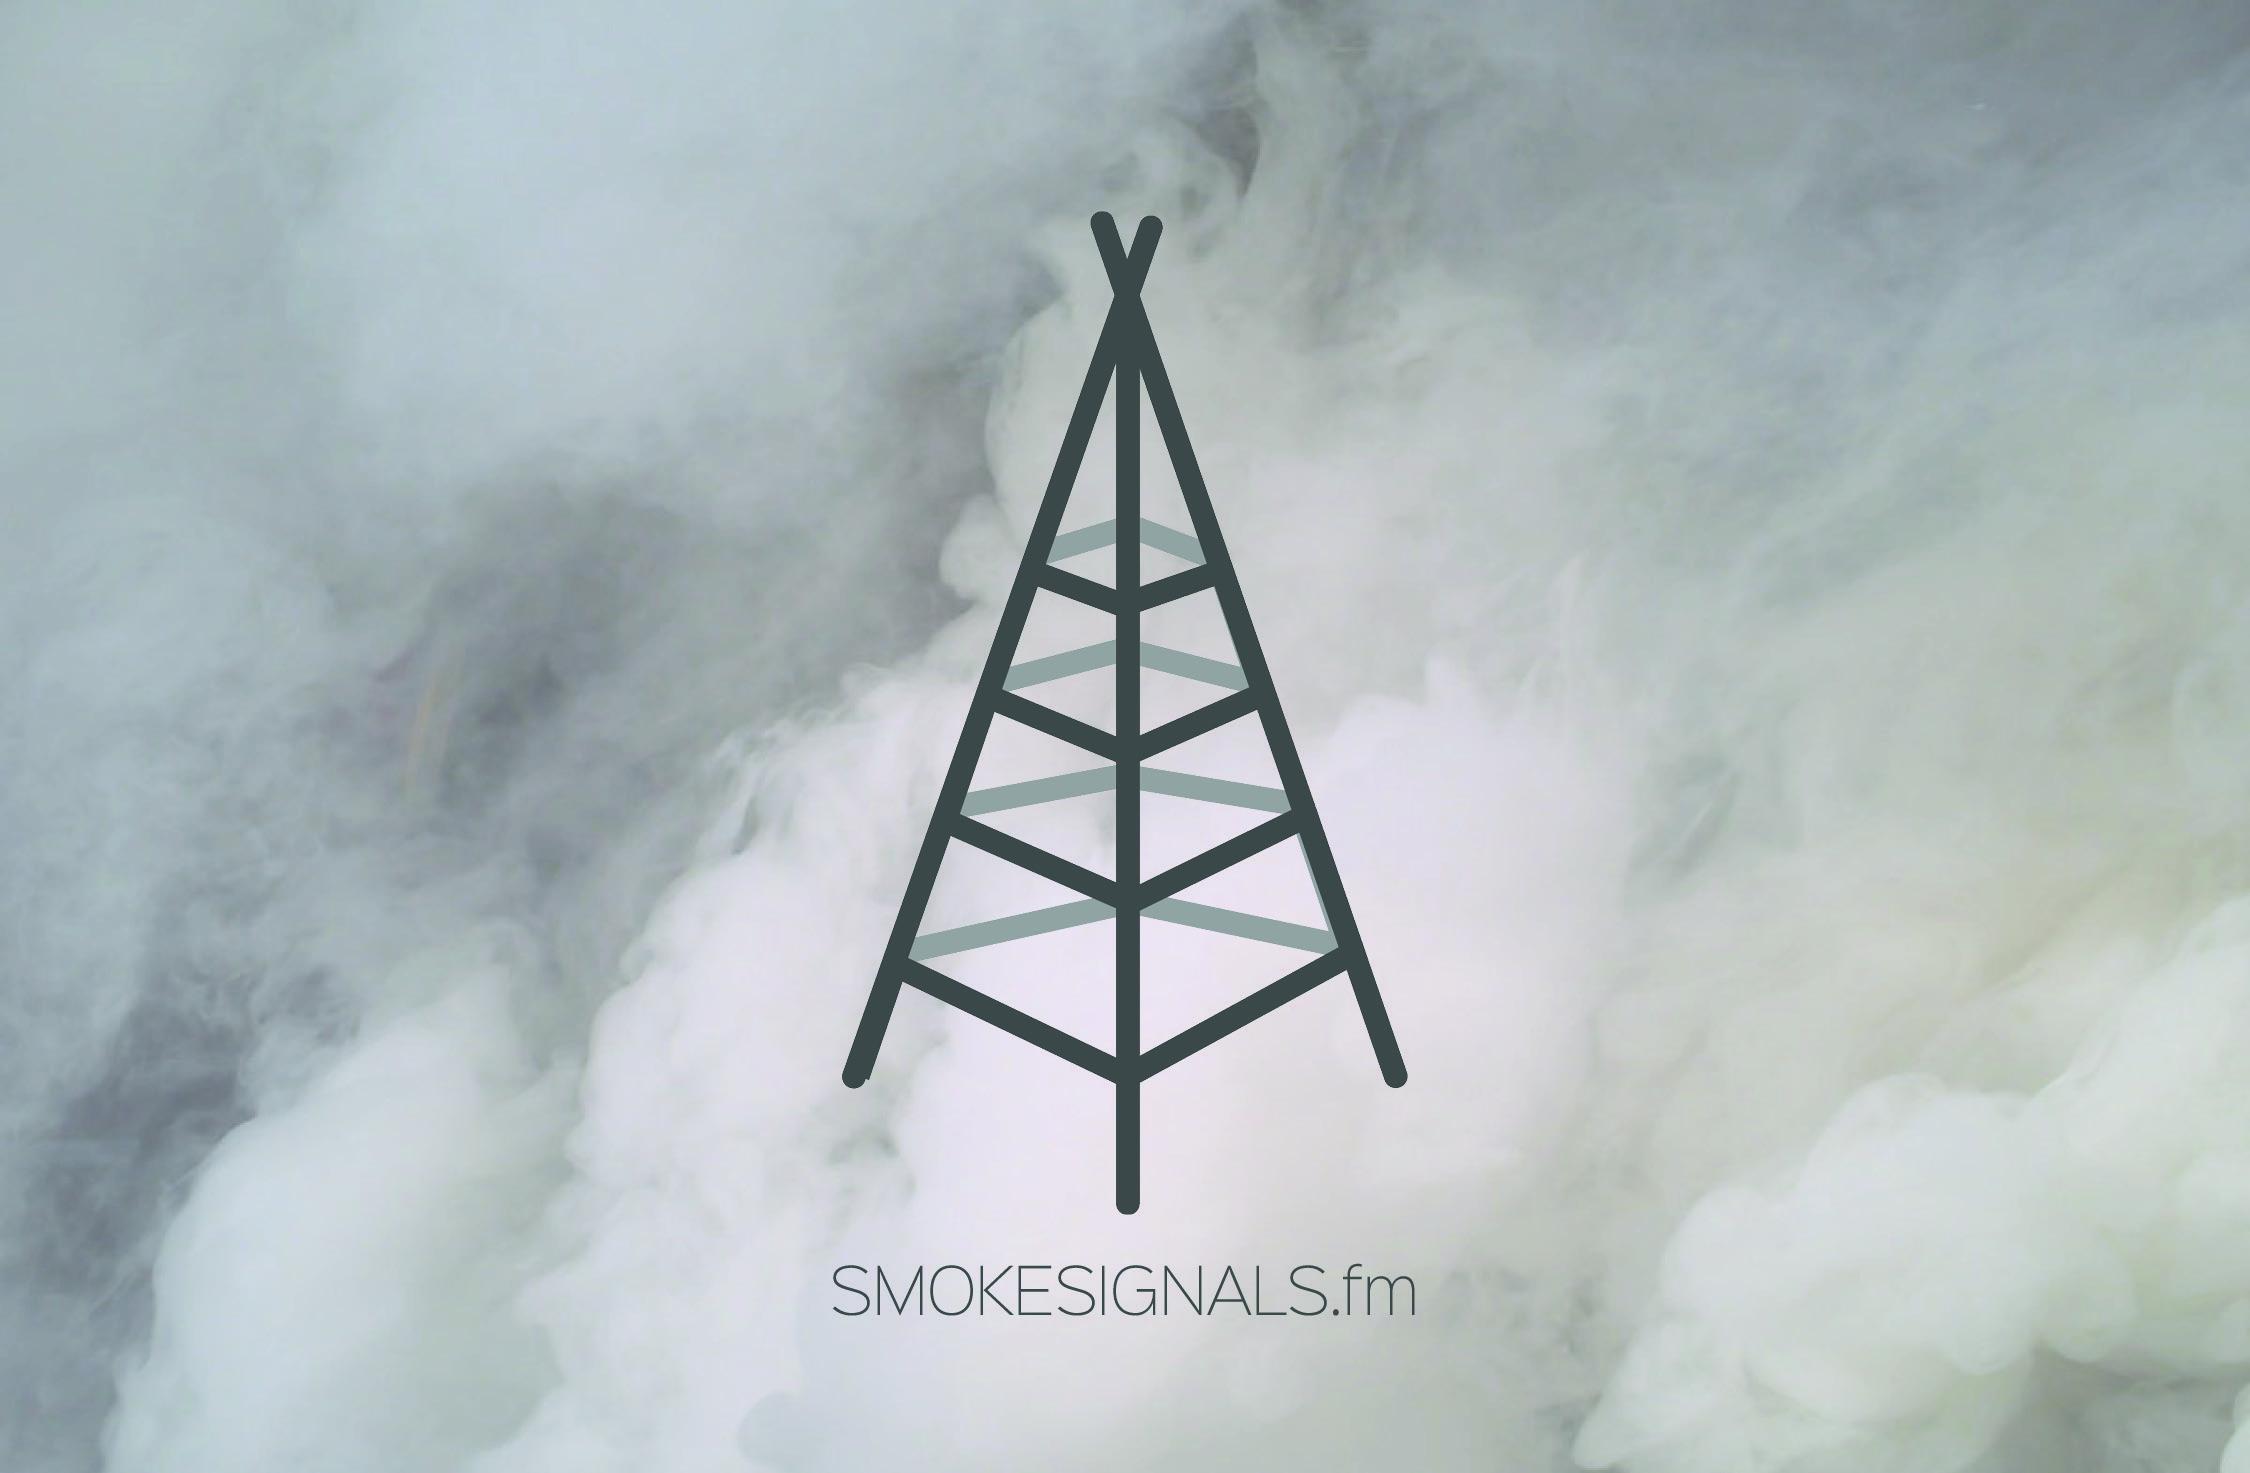 Smoke Signals.fm